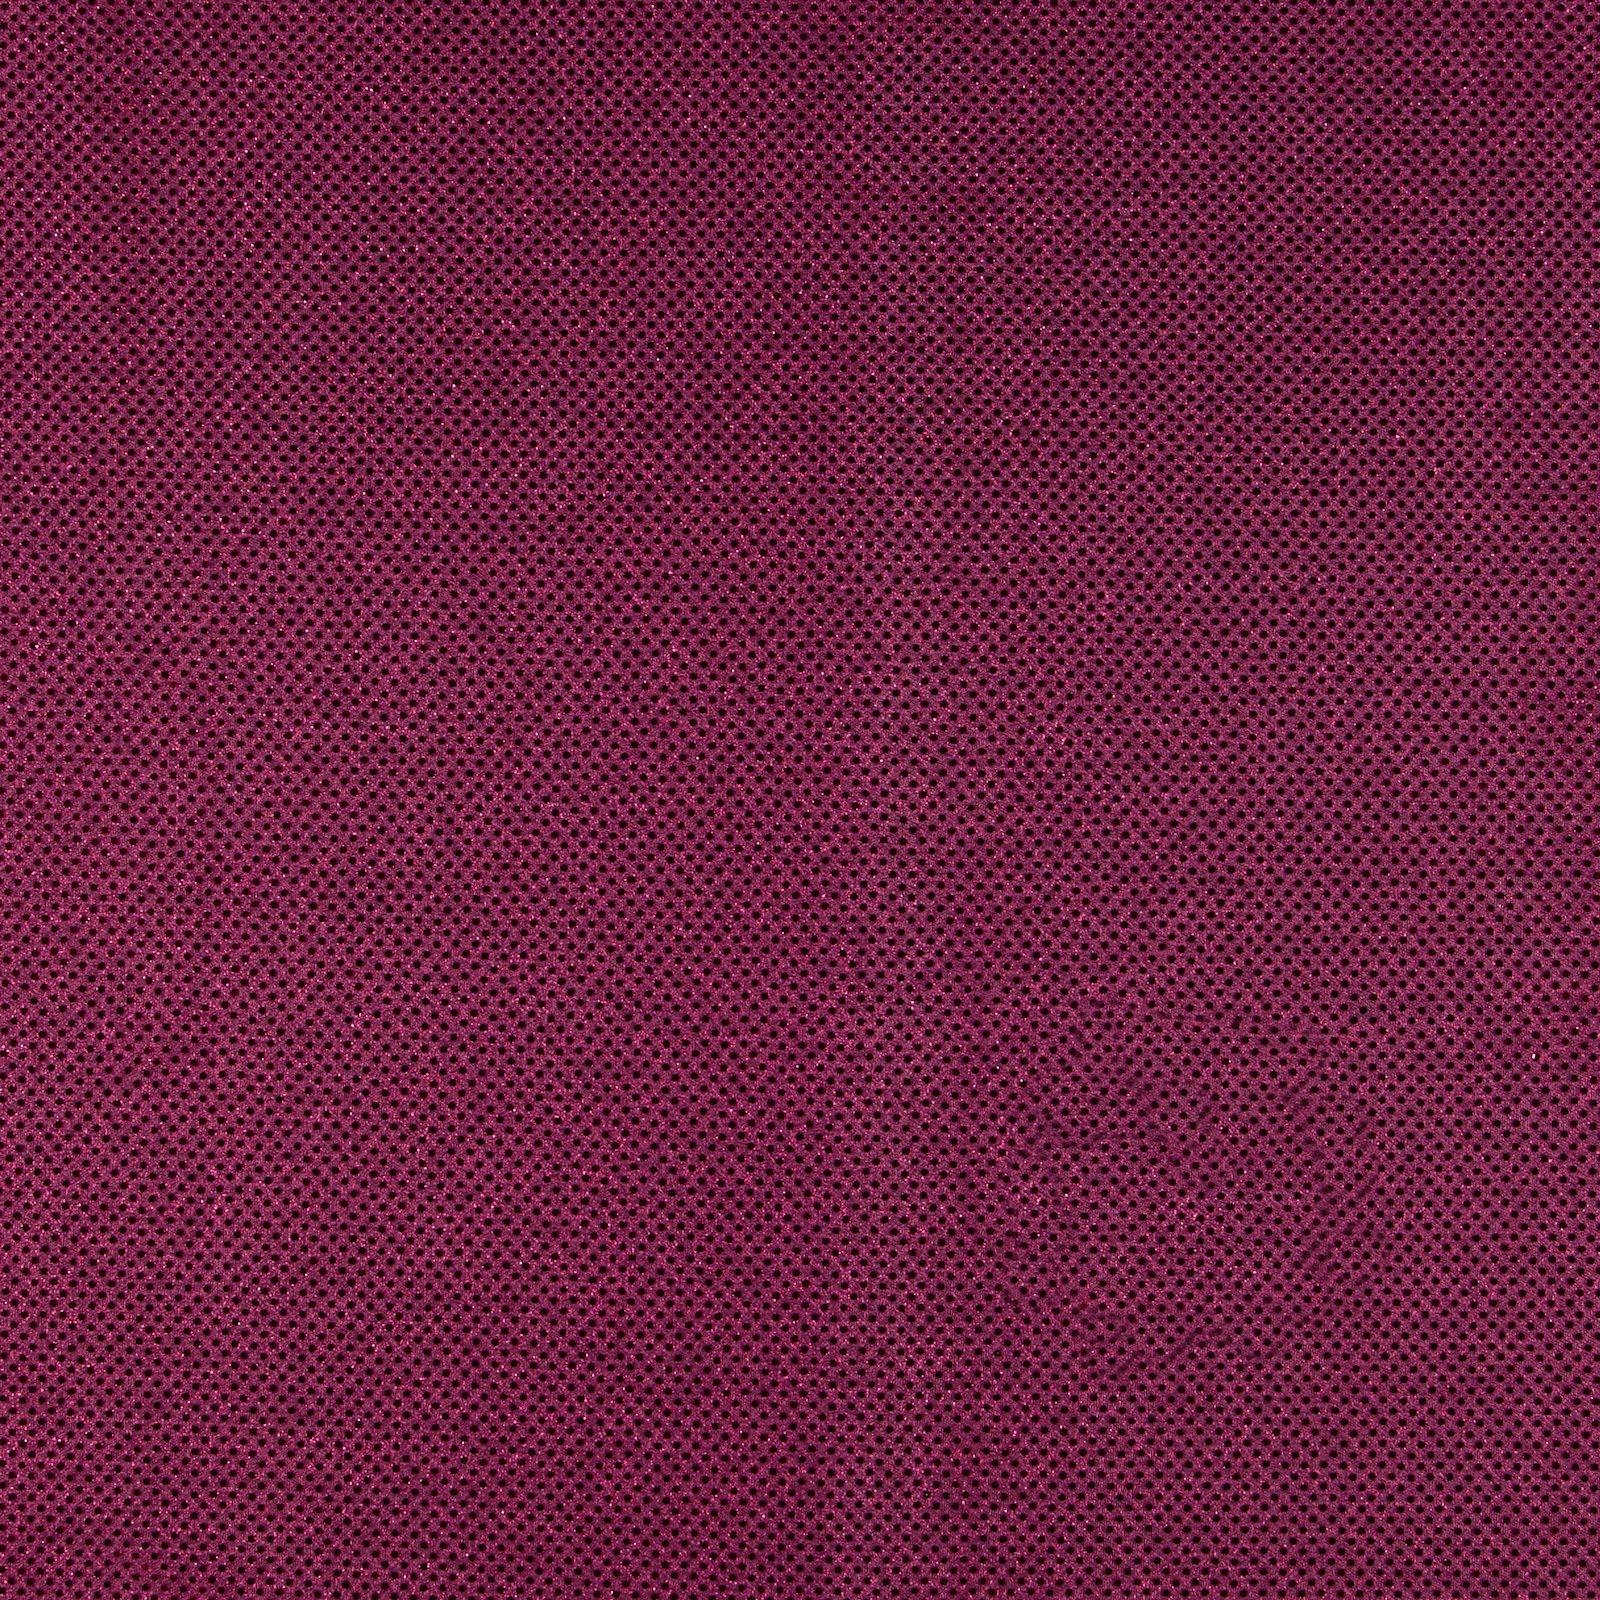 Knit with foil sequins pink 3mm 203749_pack_sp